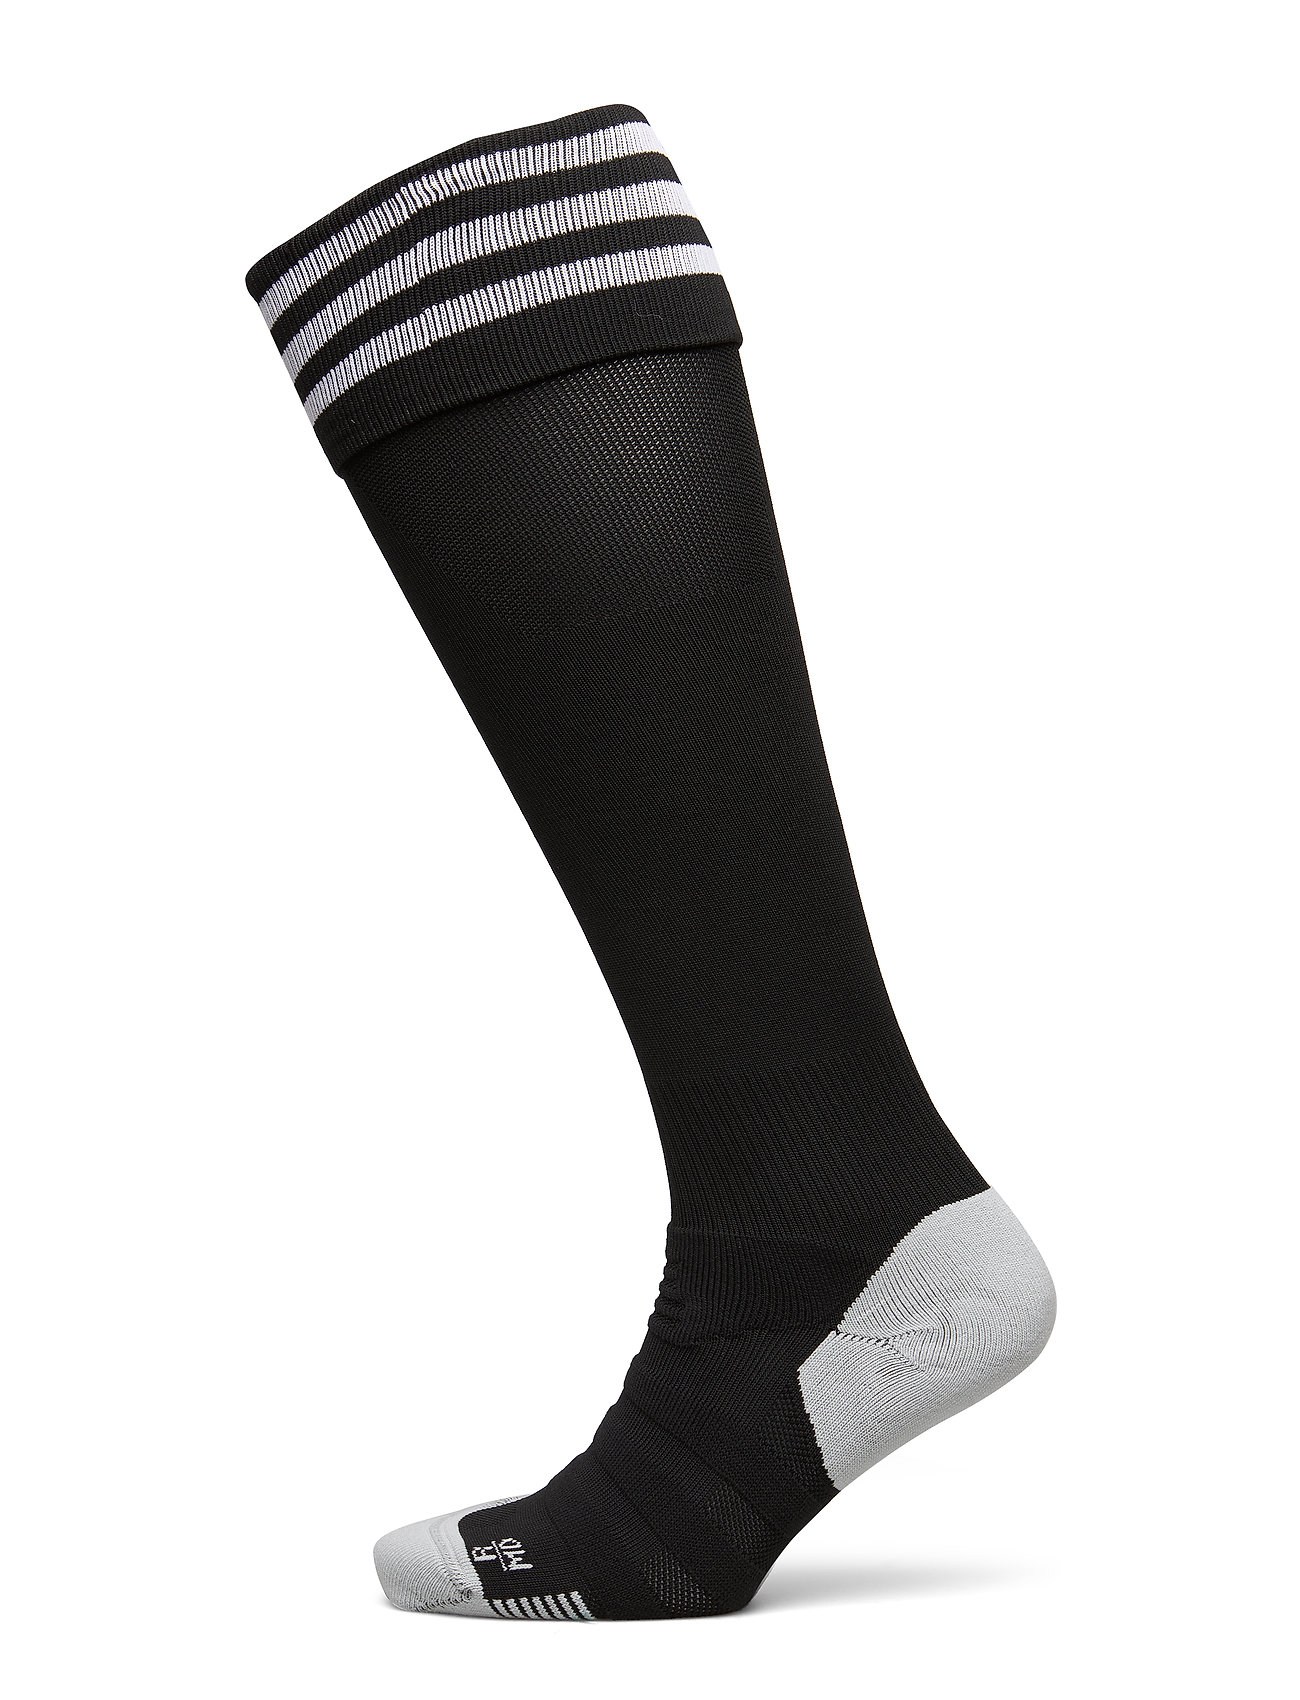 adidas Performance ADI SOCK 18 - BLACK/WHITE